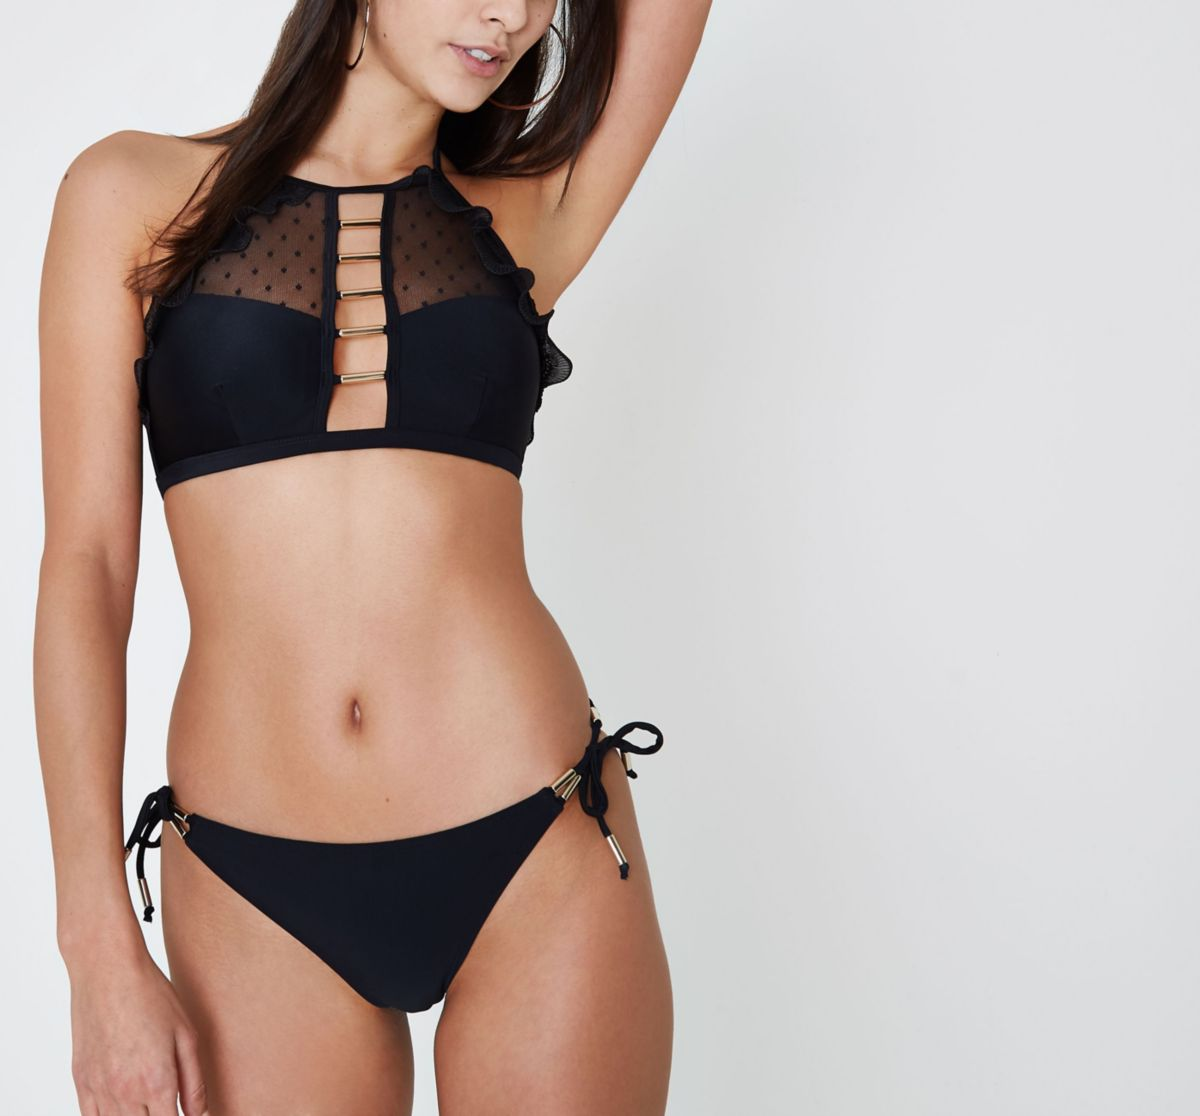 Zwart bikinibroekje met zijstrikjes